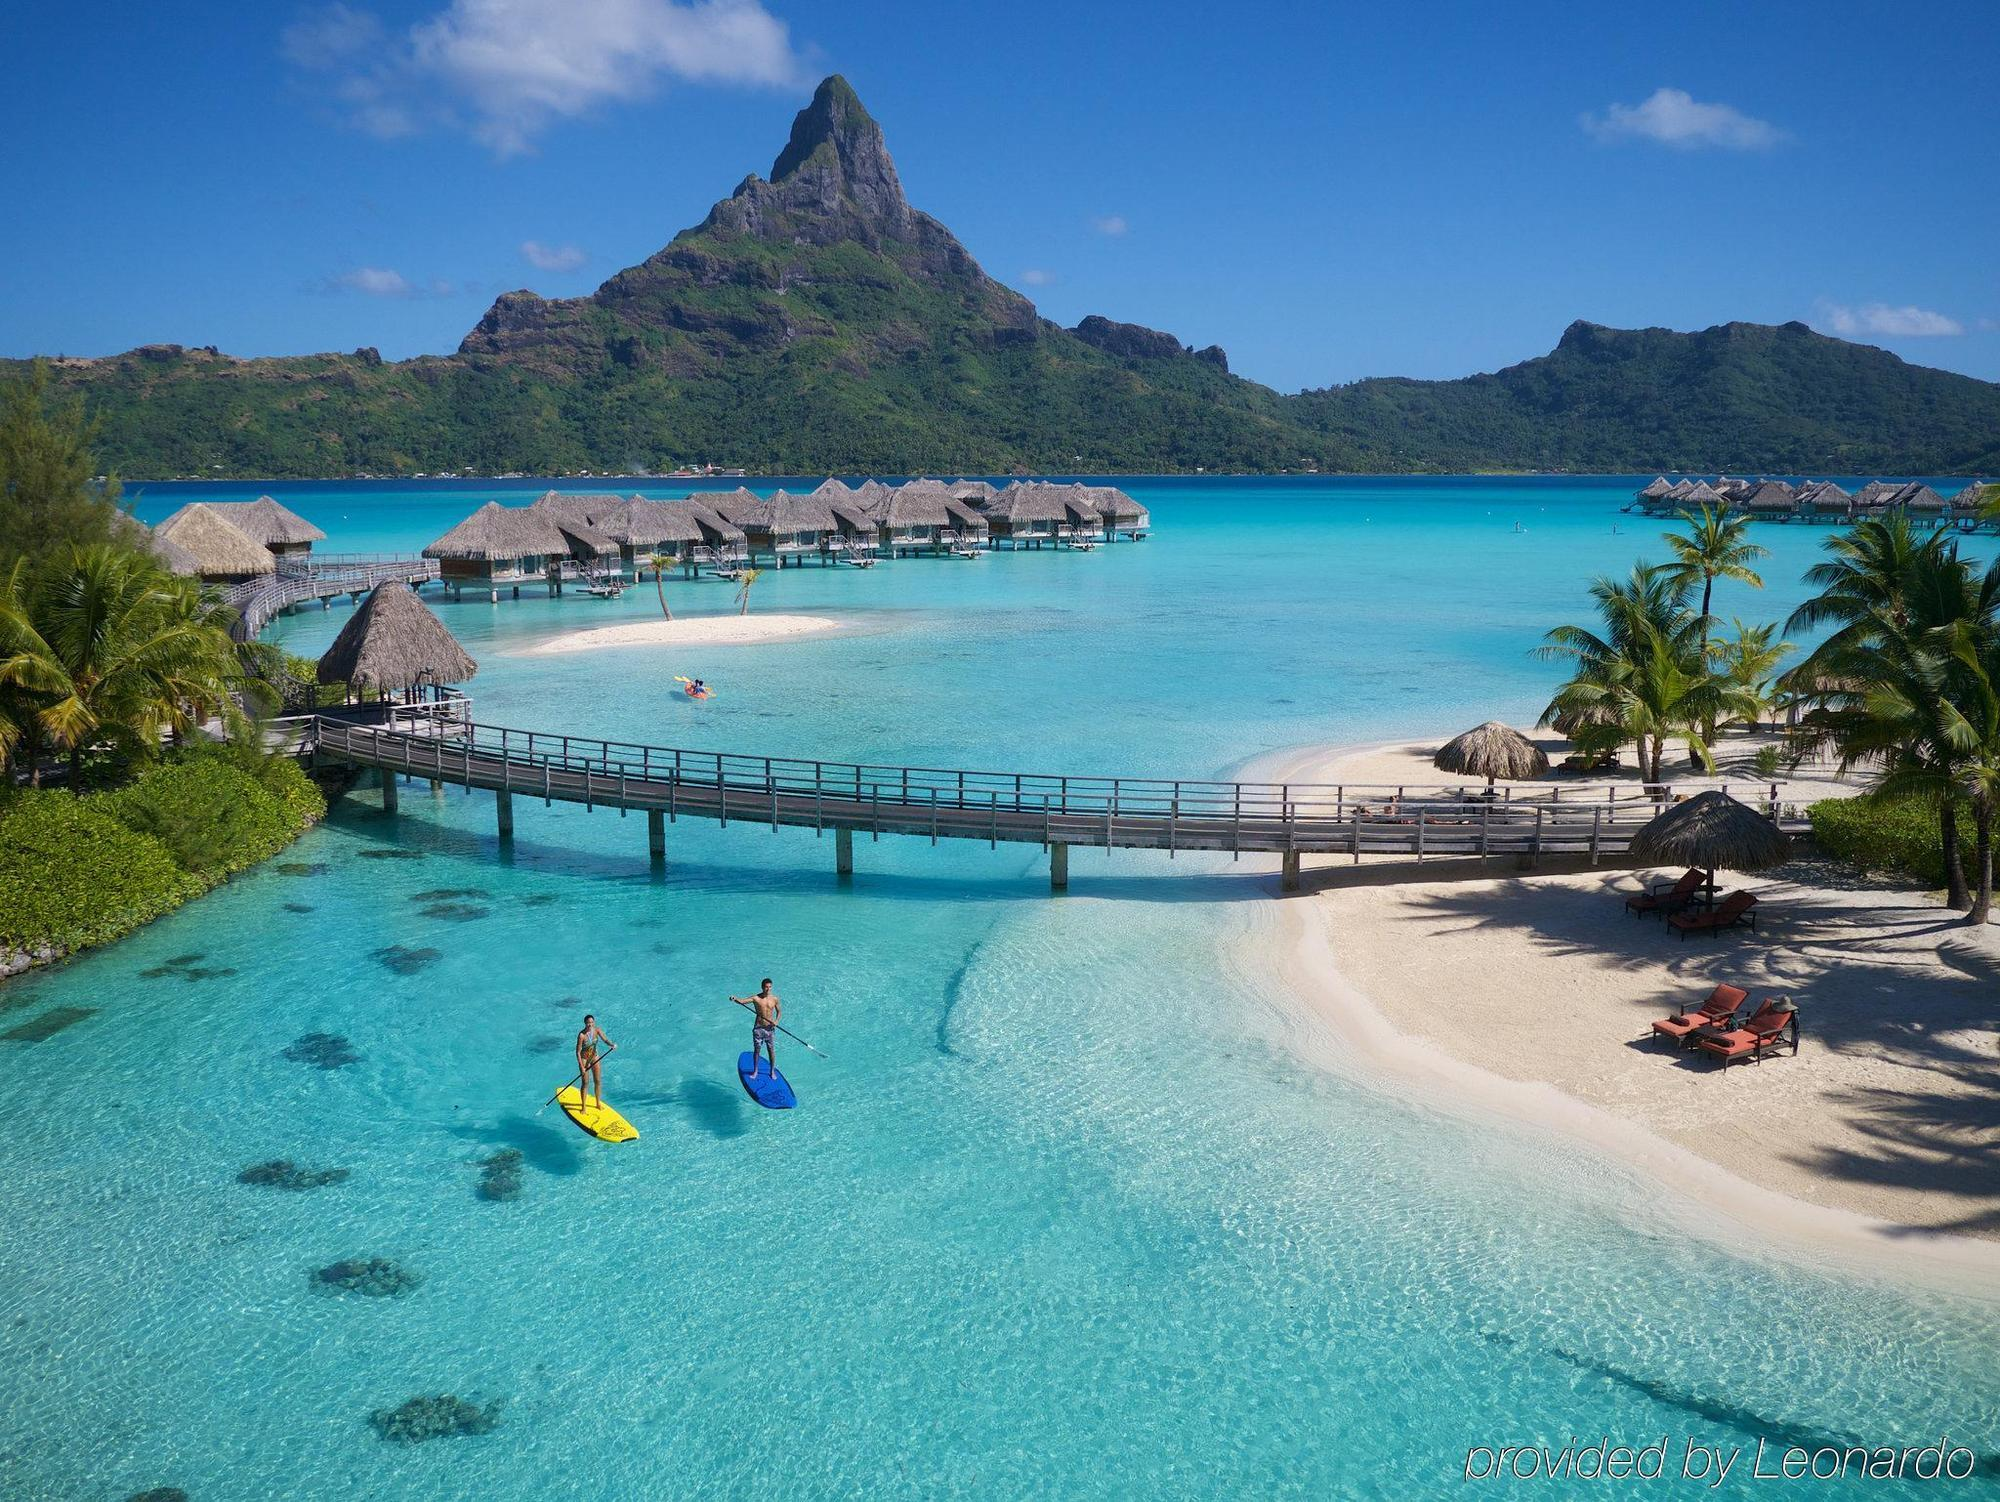 Bora Bora -InterContinental Bora Bora Resort & Thalass